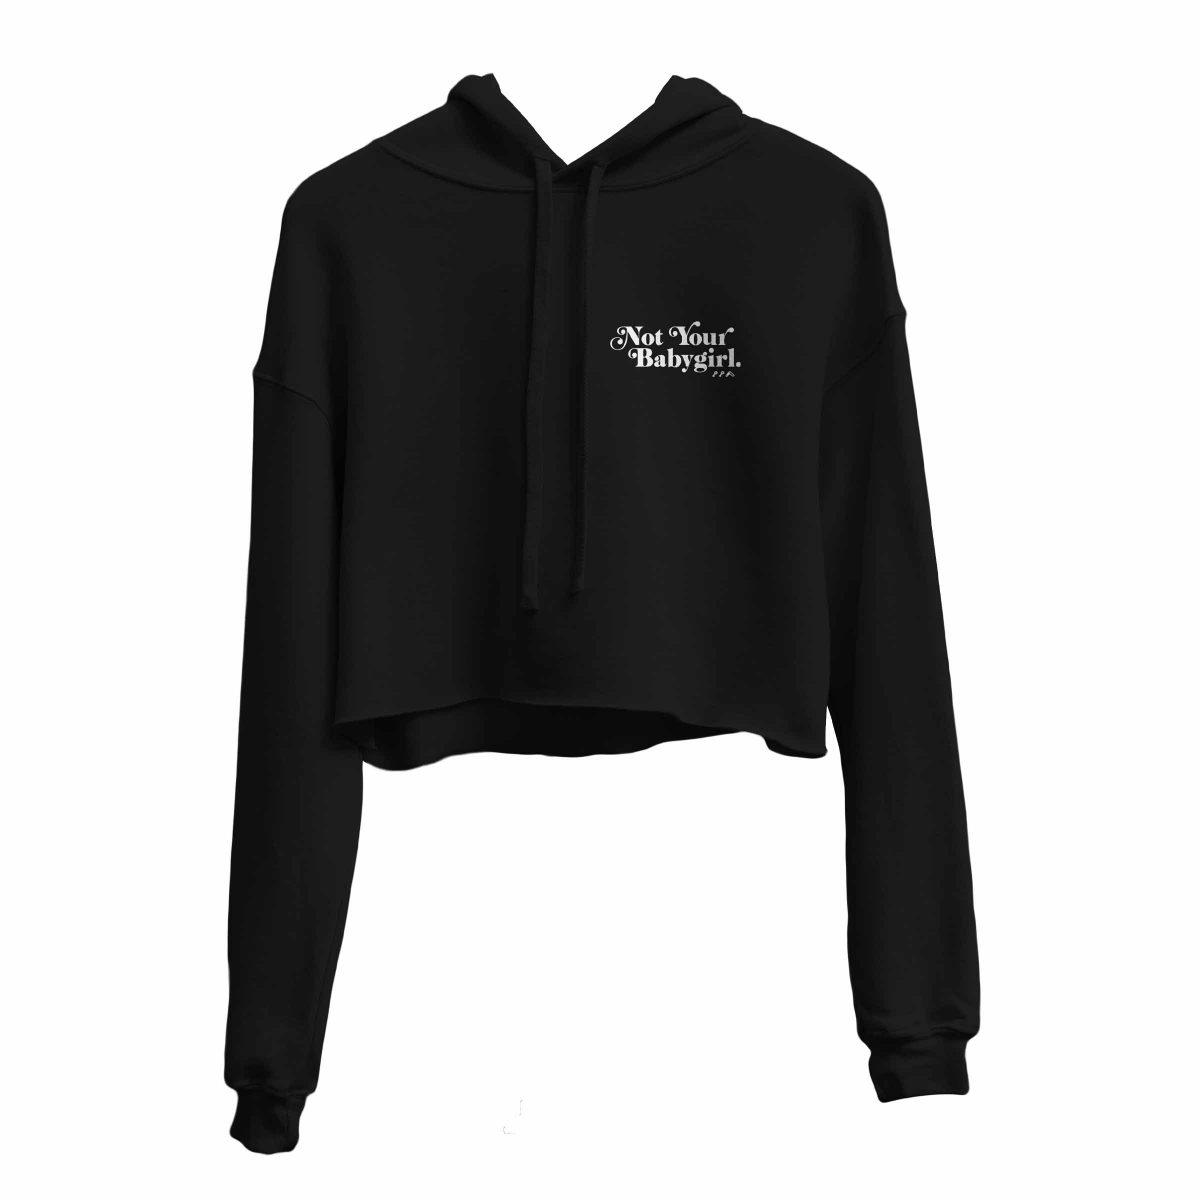 NOT YOUR BABYGIRL crop hoodie by kikicutt